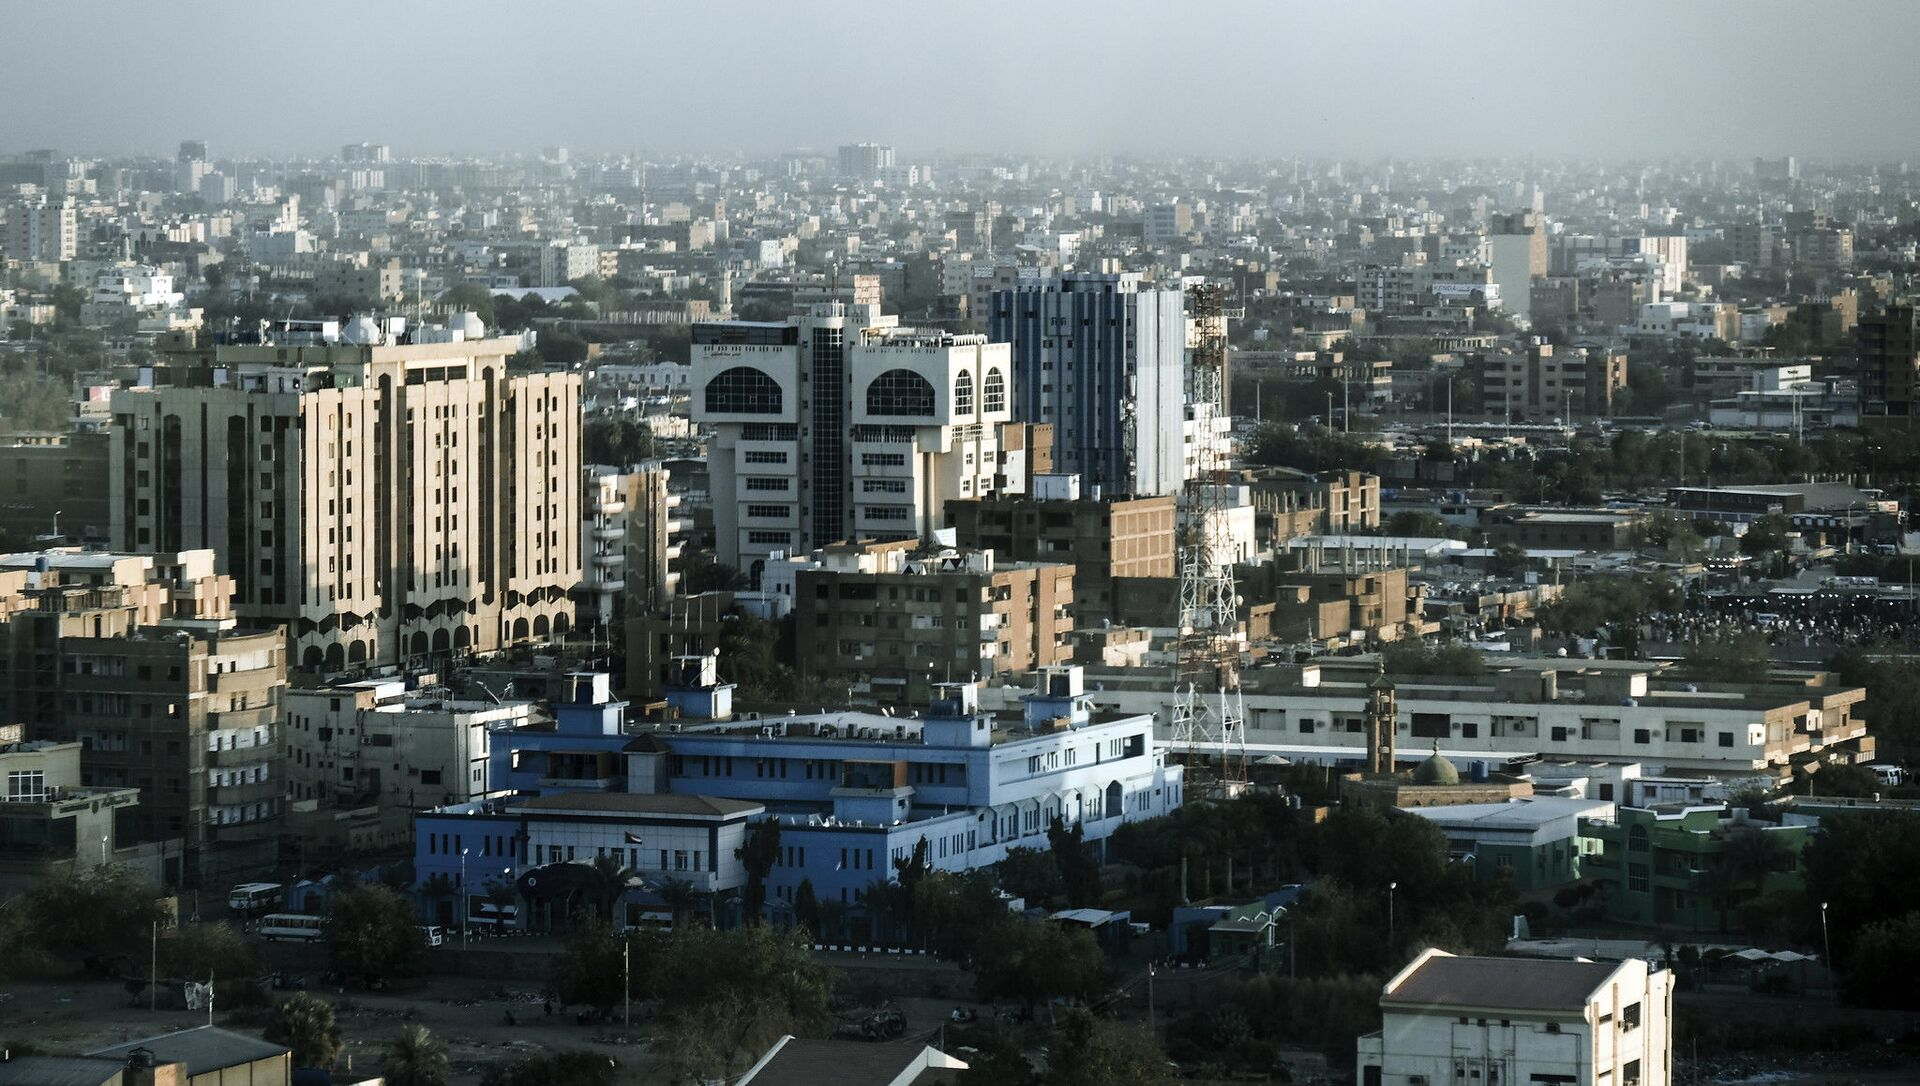 Khartoum, Soudan - Sputnik France, 1920, 05.09.2021